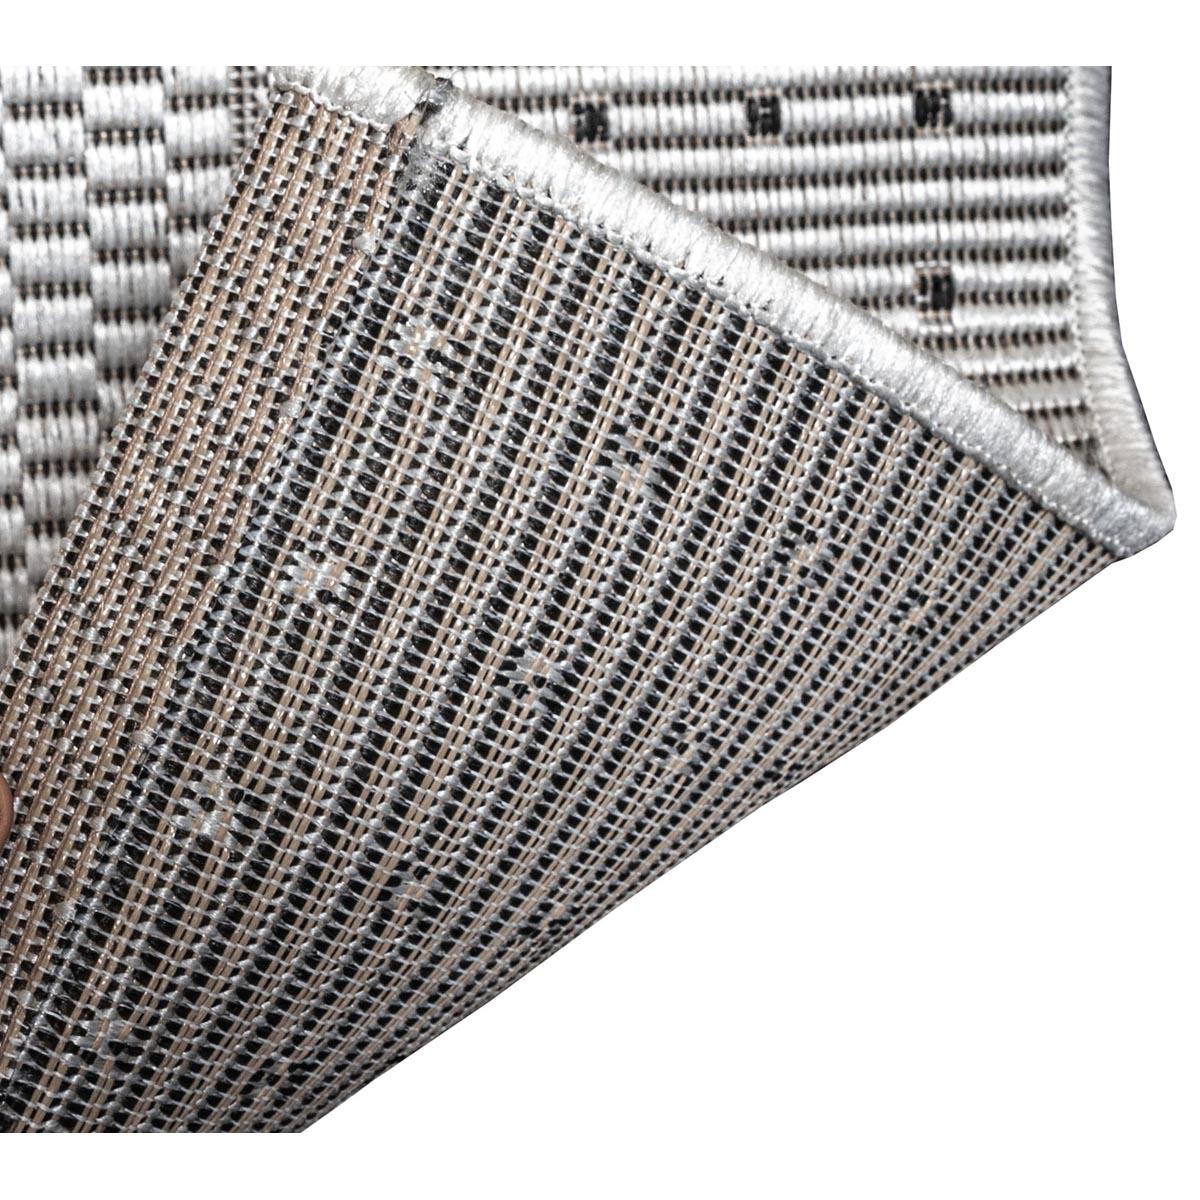 Washington-matta-silver-baksida